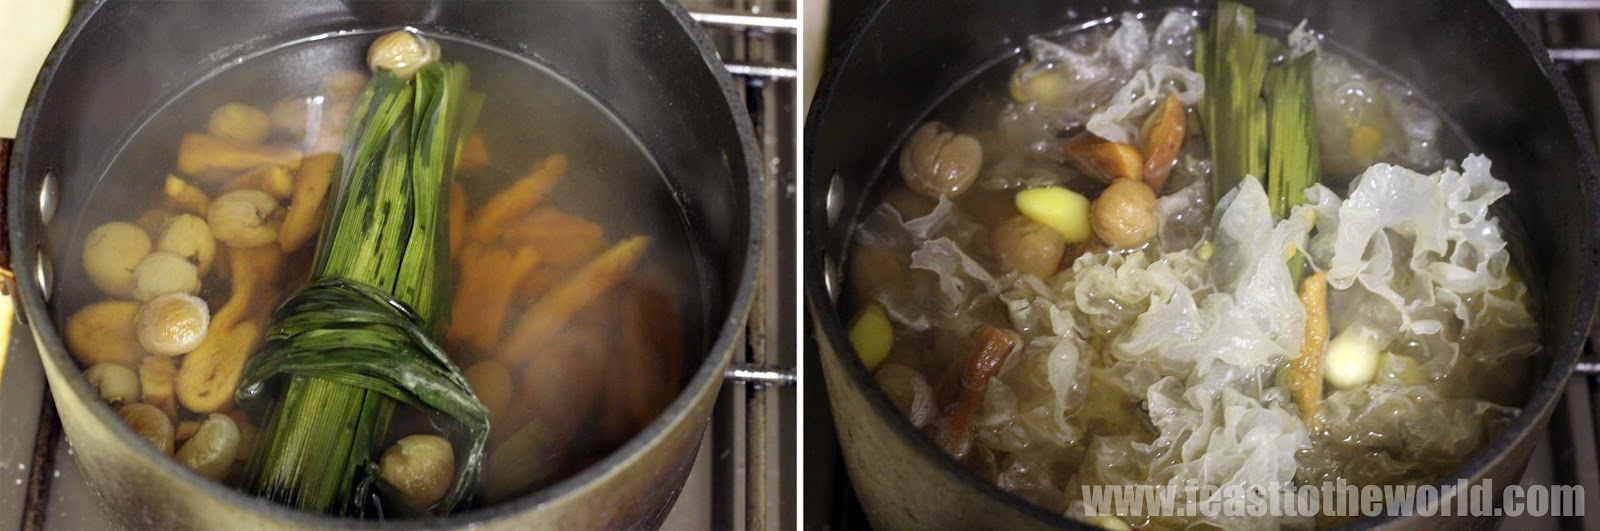 Ladle Soup Kitchen San Diego